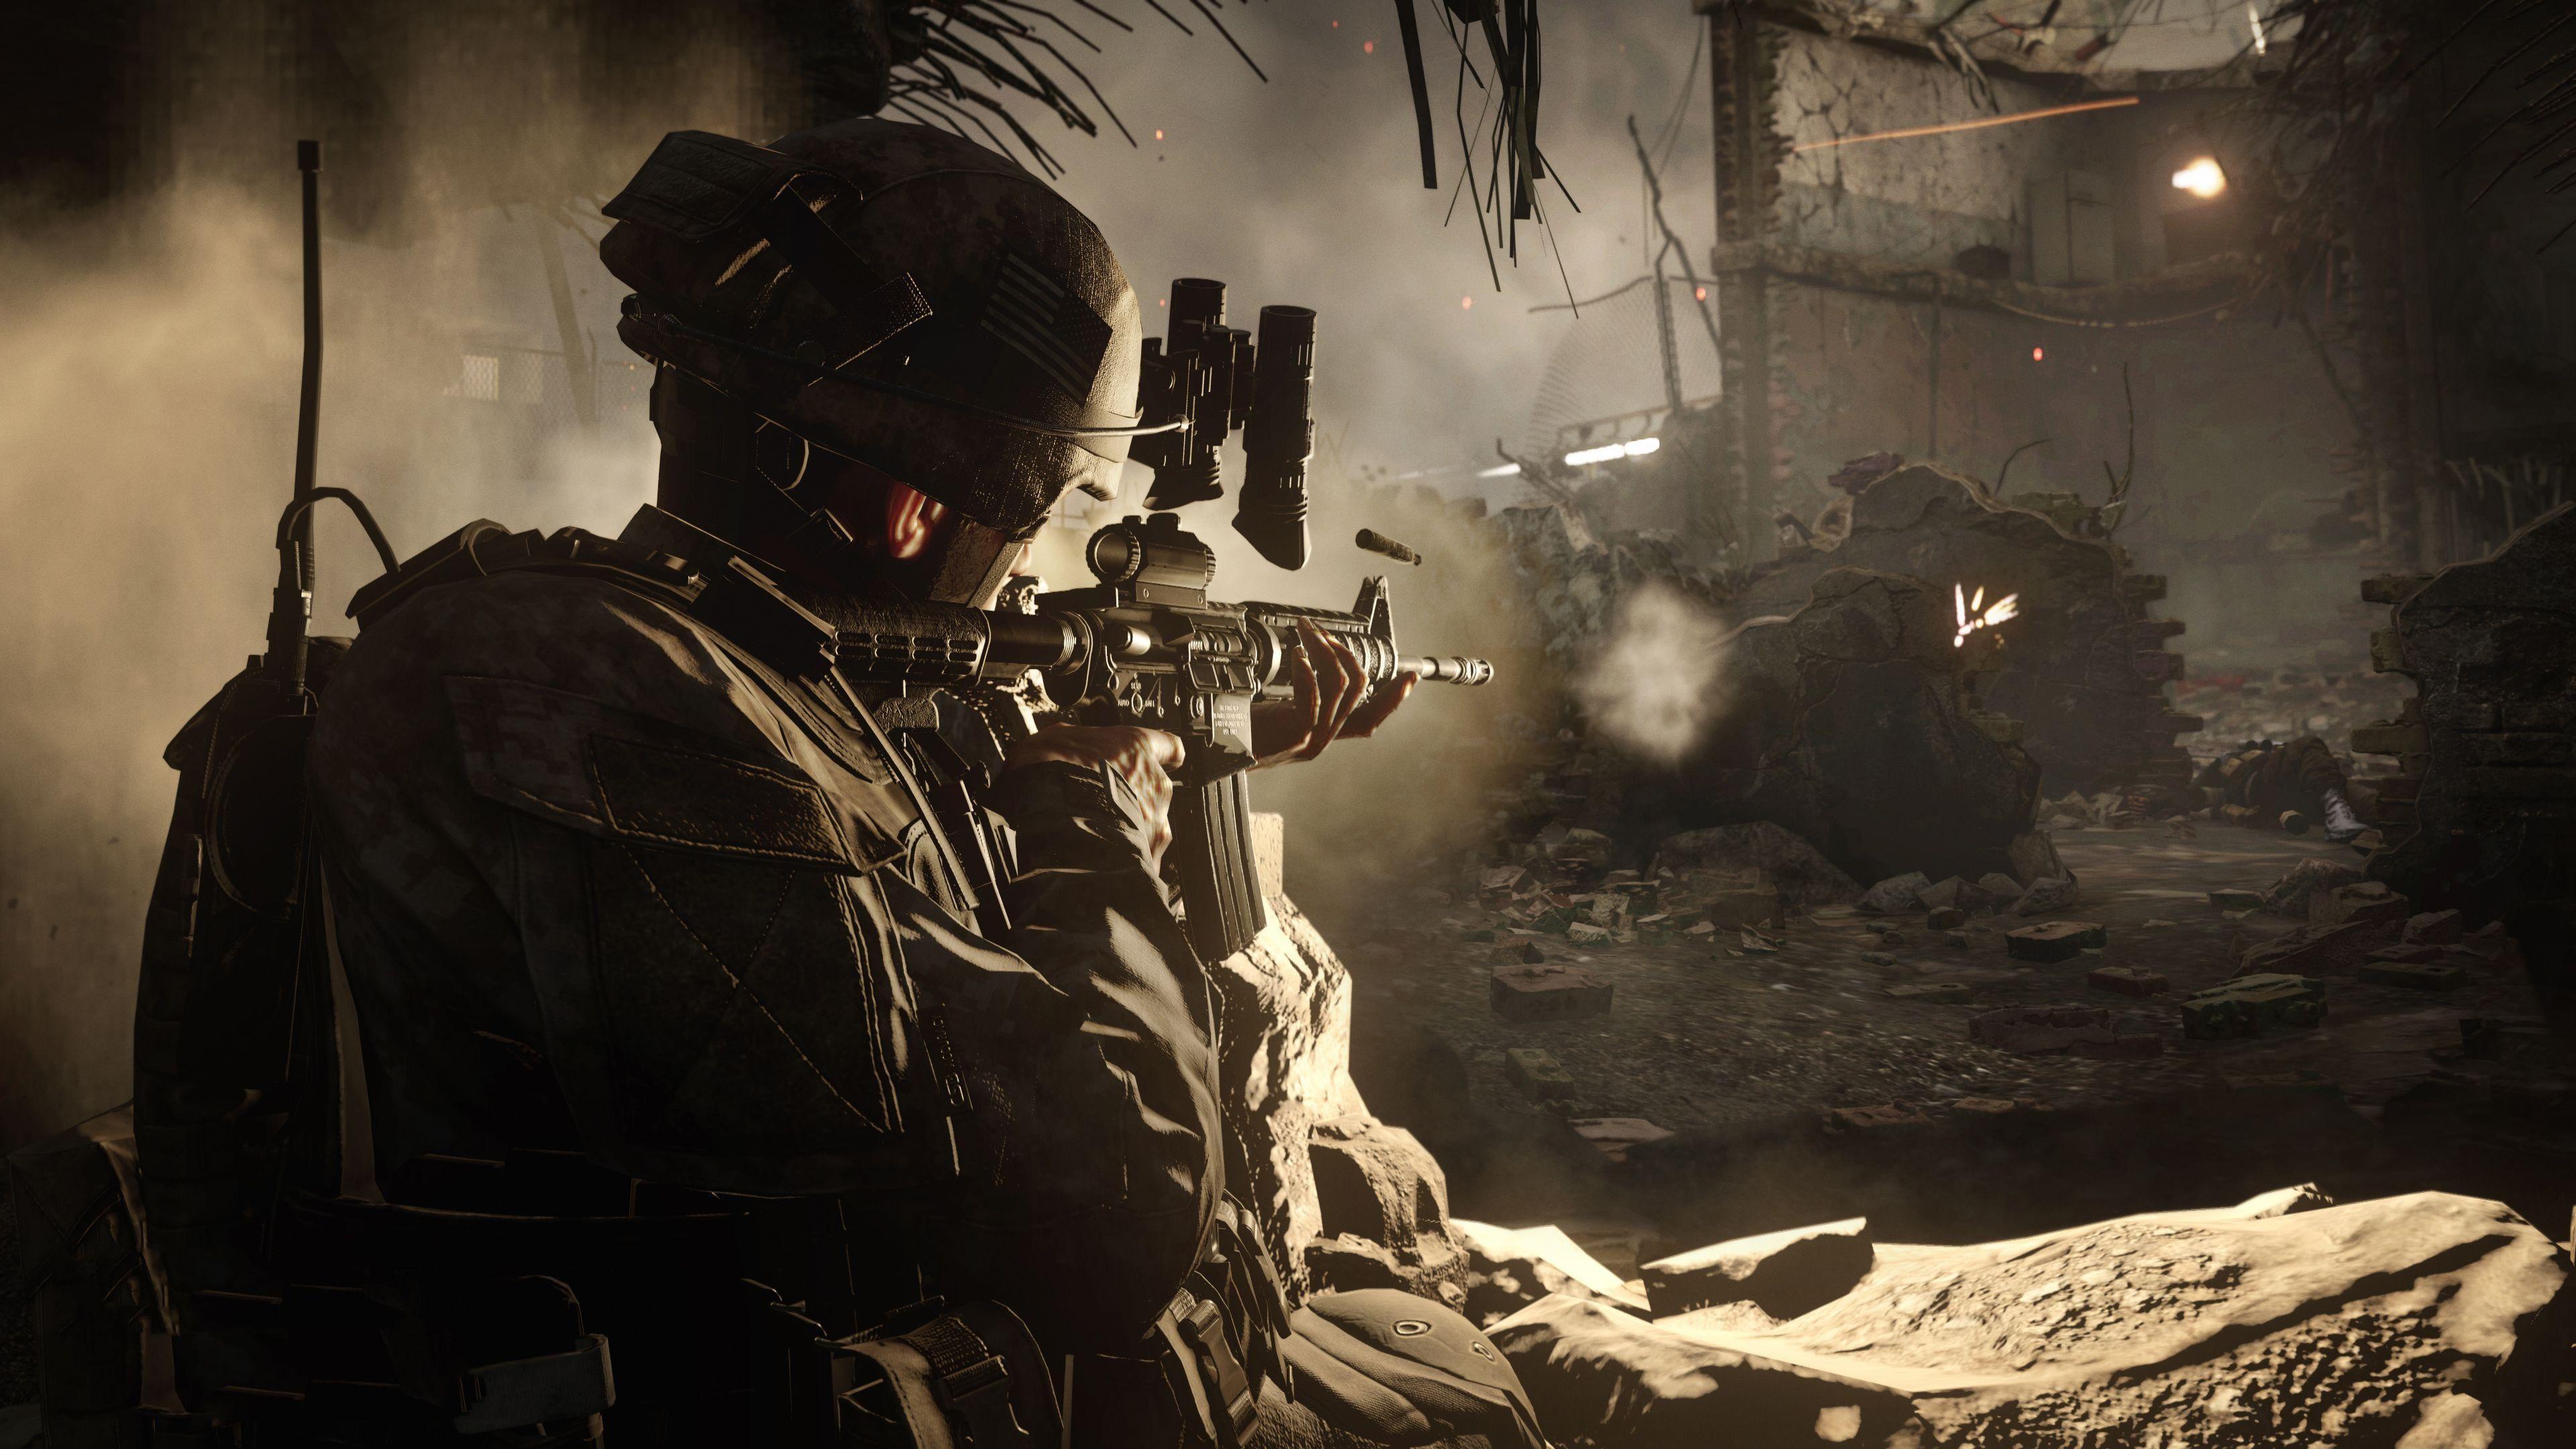 Call of Duty Modern Warfare 2019 Wallpapers - Top Free ...